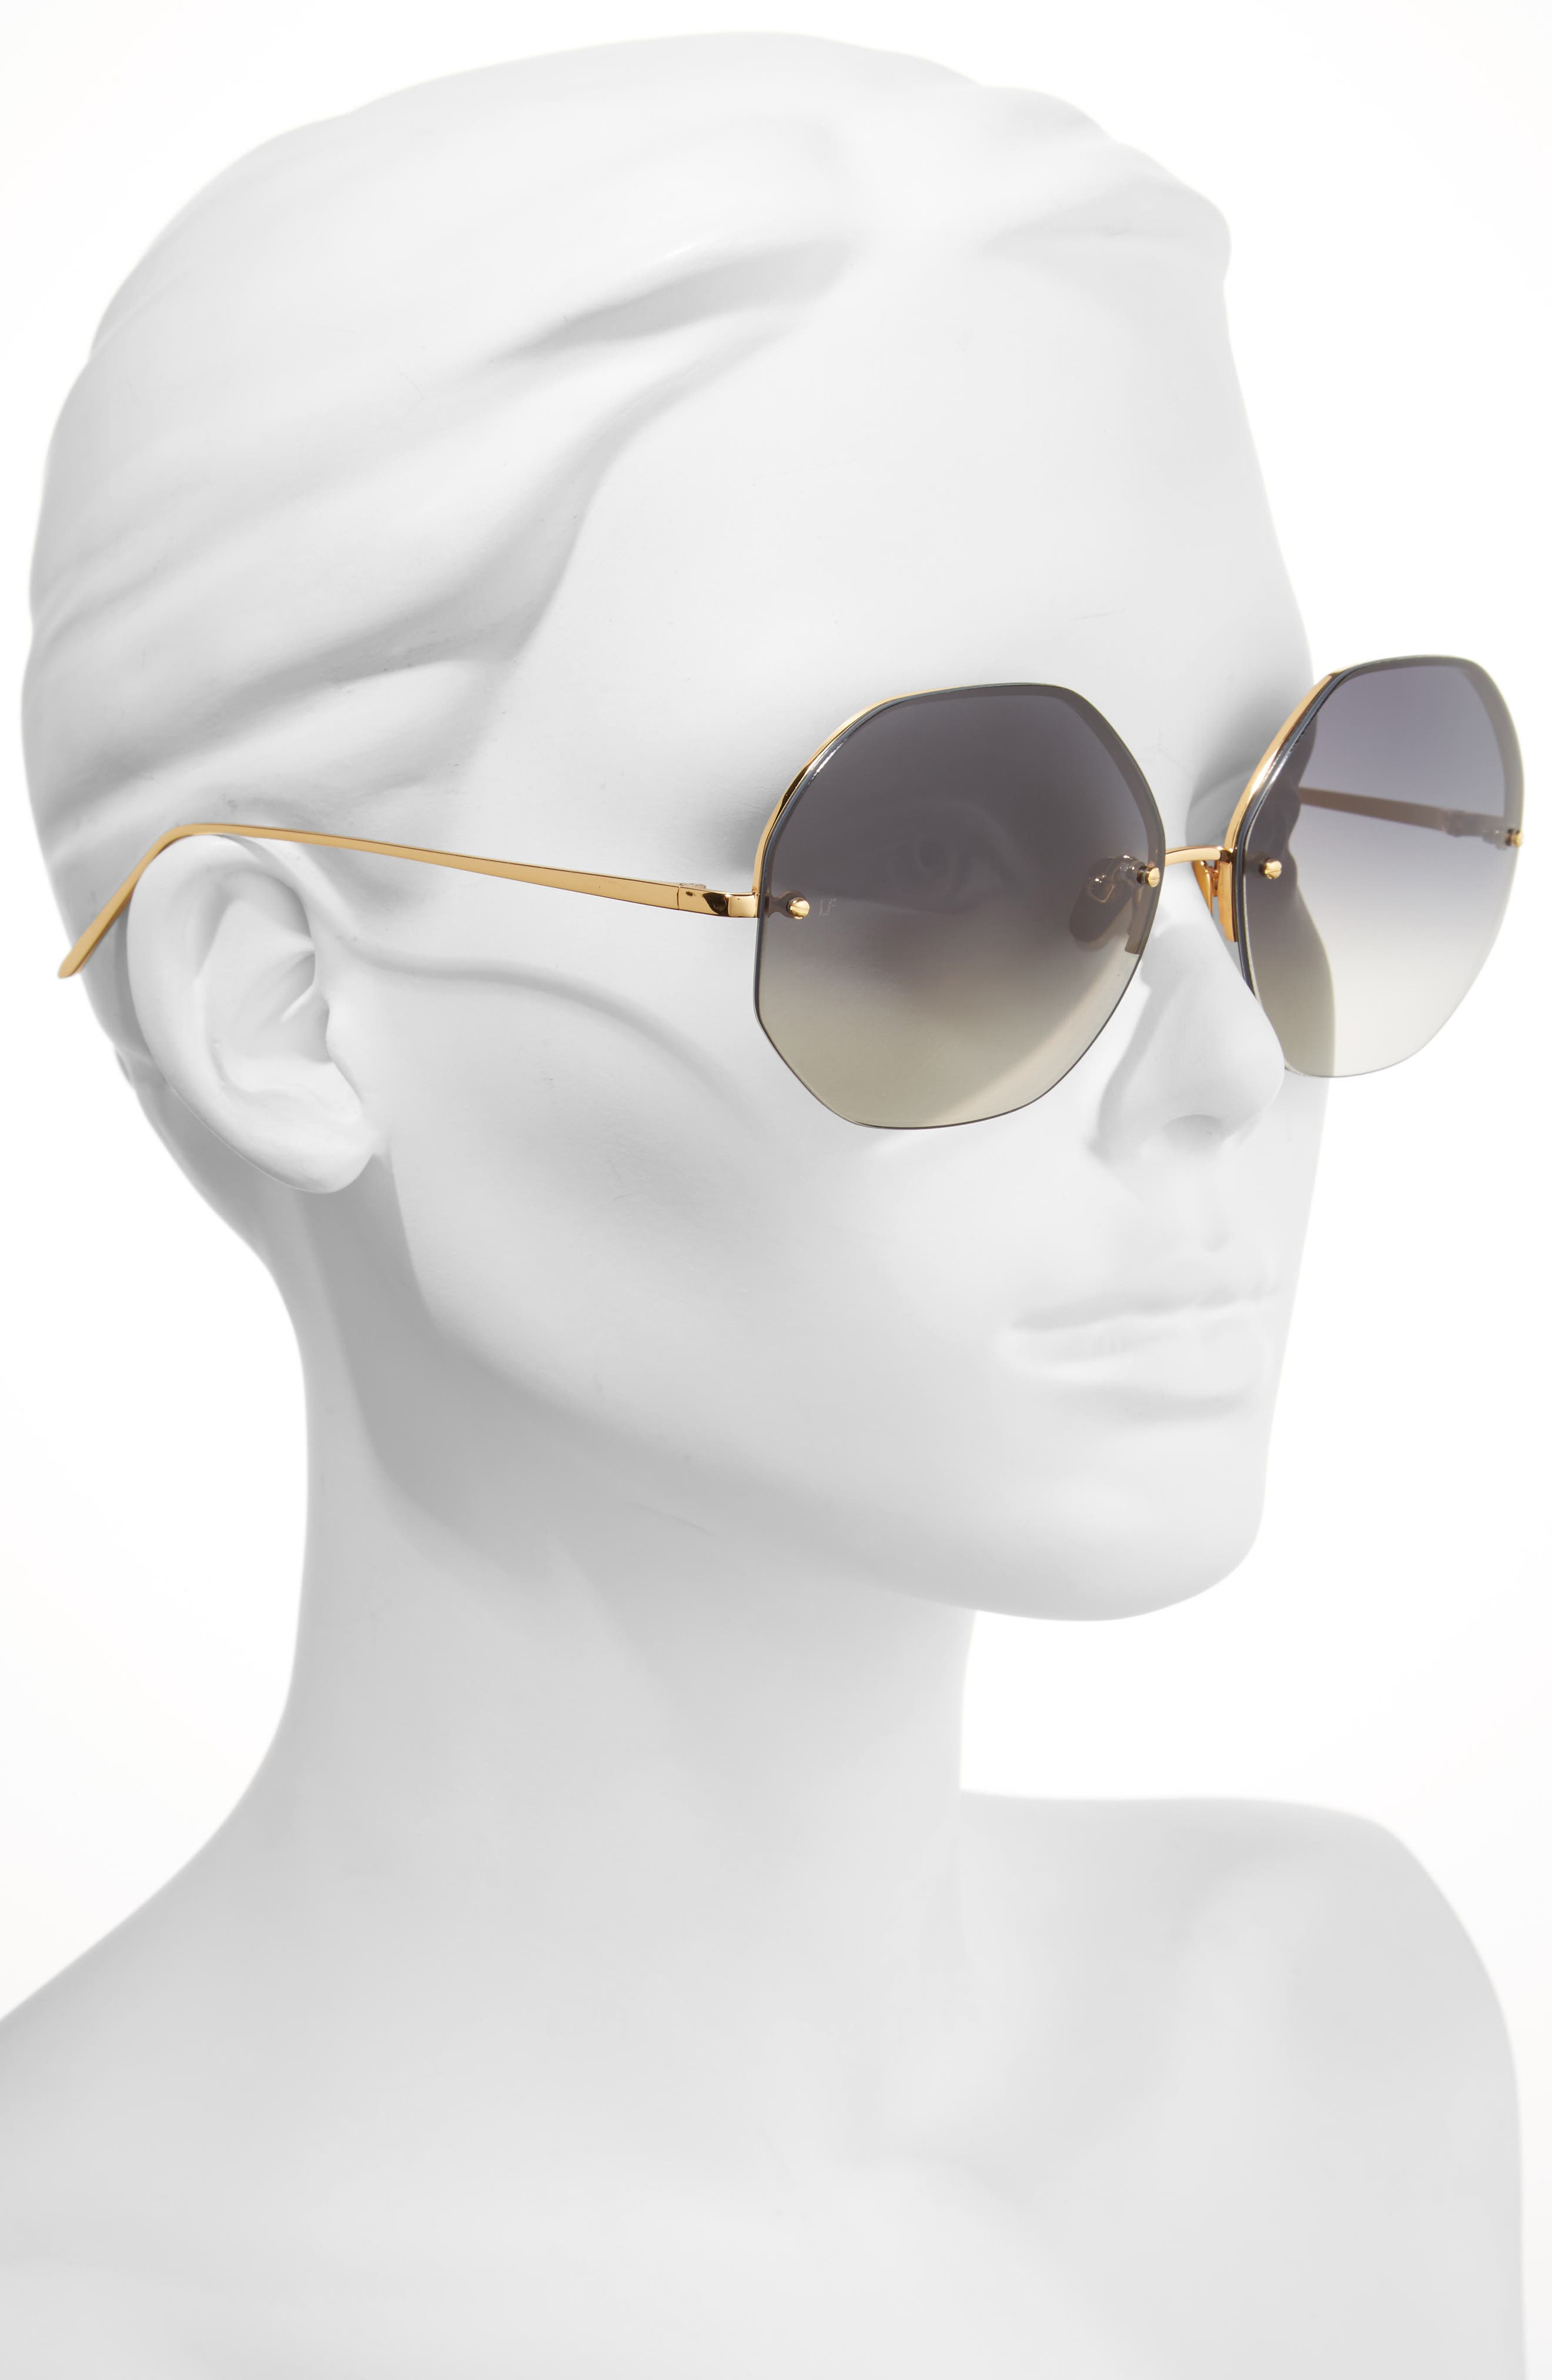 63mm Semi Rimless Round Titanium Sunglasses,                             Alternate thumbnail 2, color,                             Yellow Gold/ Grey